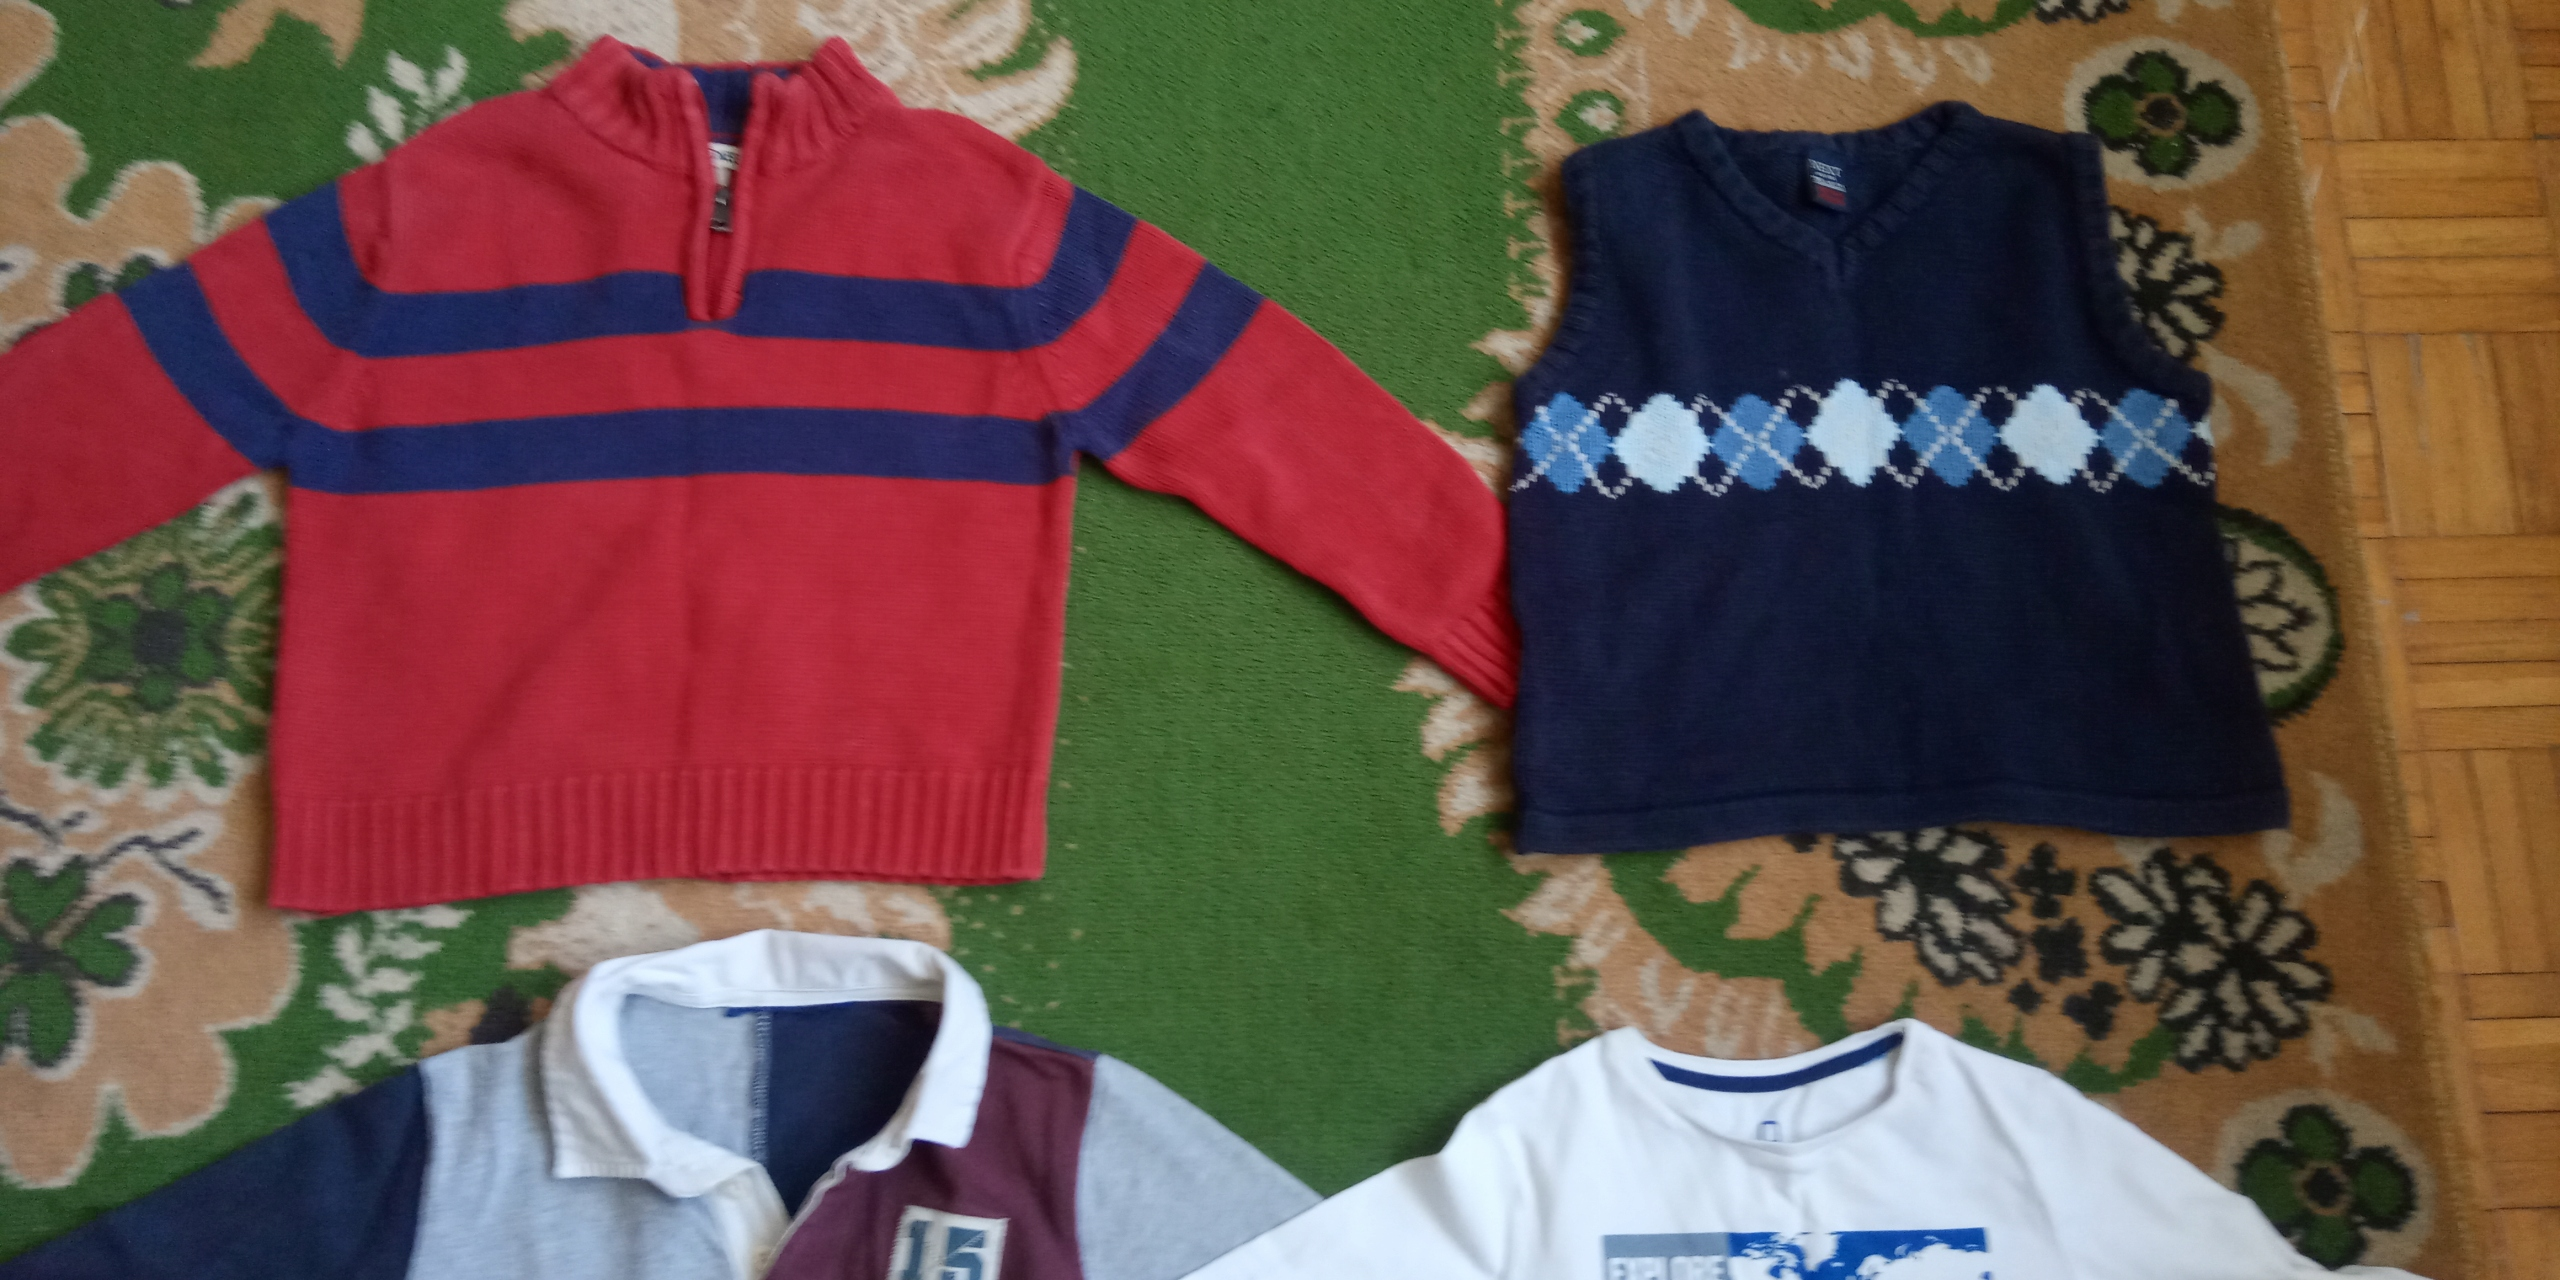 Cherokee zestaw 4 ubrań r. 110 chłopak 4-5 lat